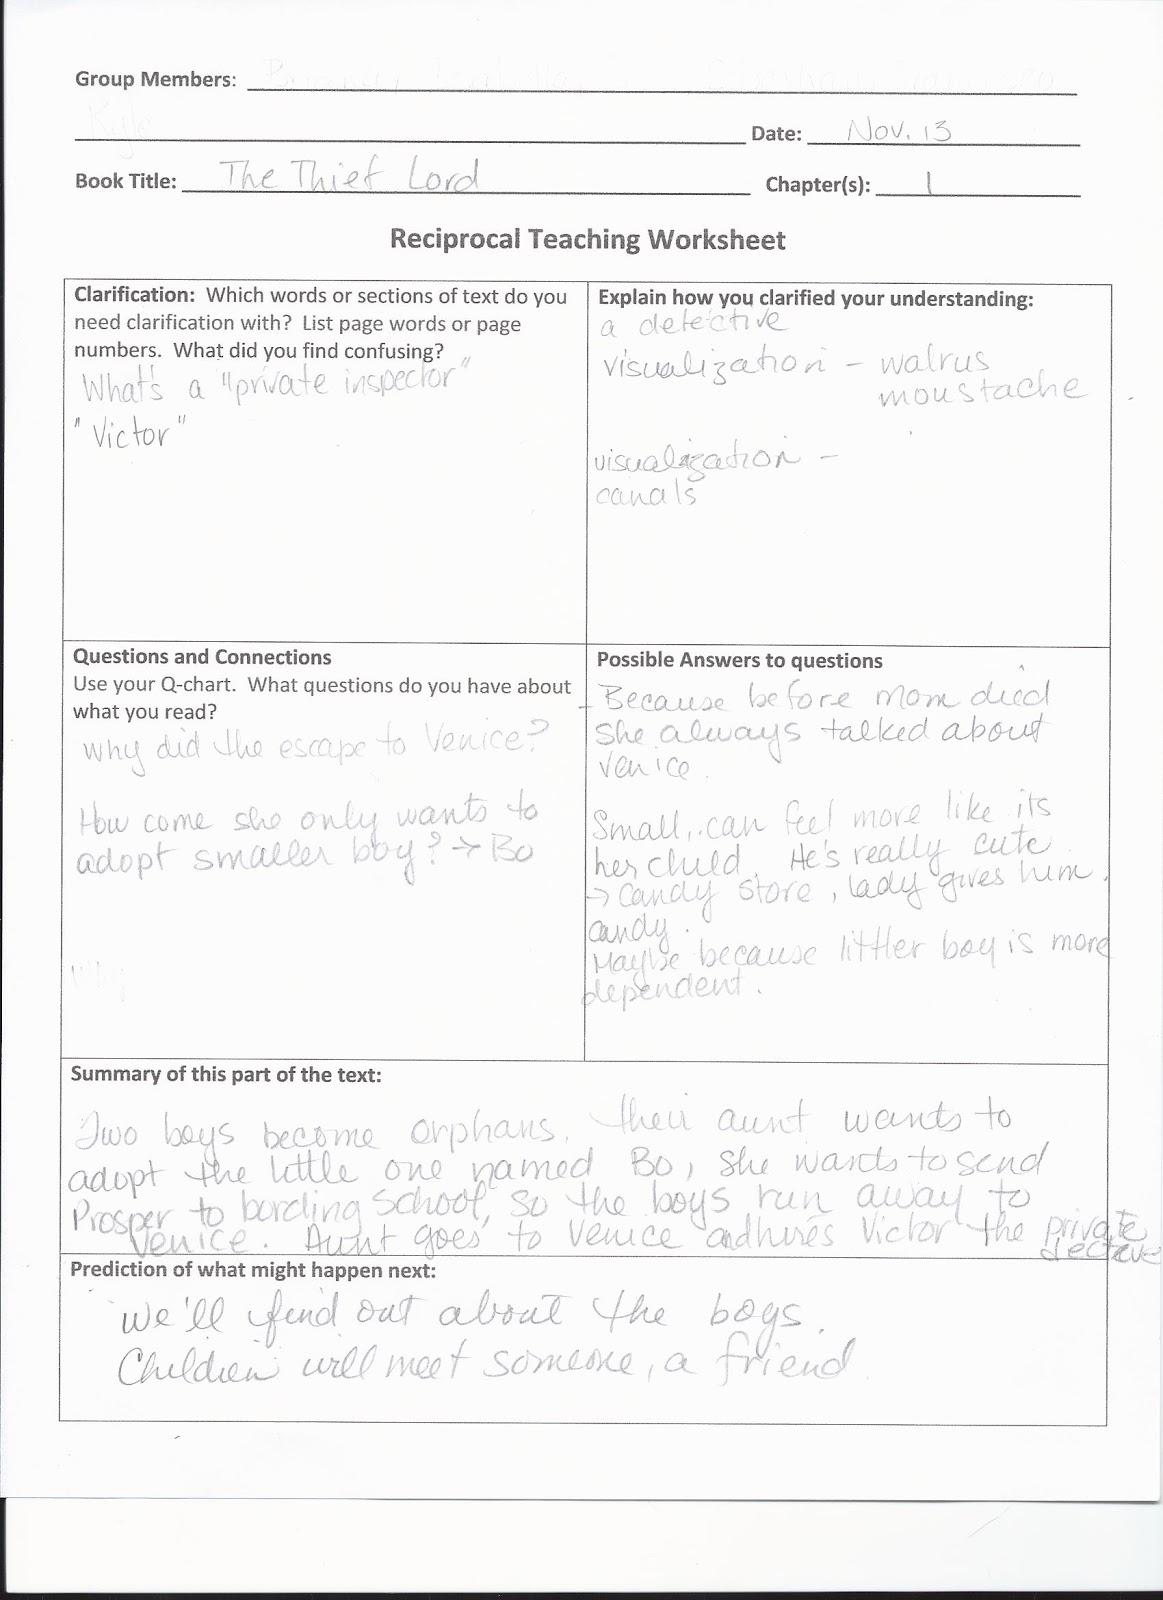 Workbooks literature circles roles worksheets : Making Shift Happen: Reciprocal Teaching